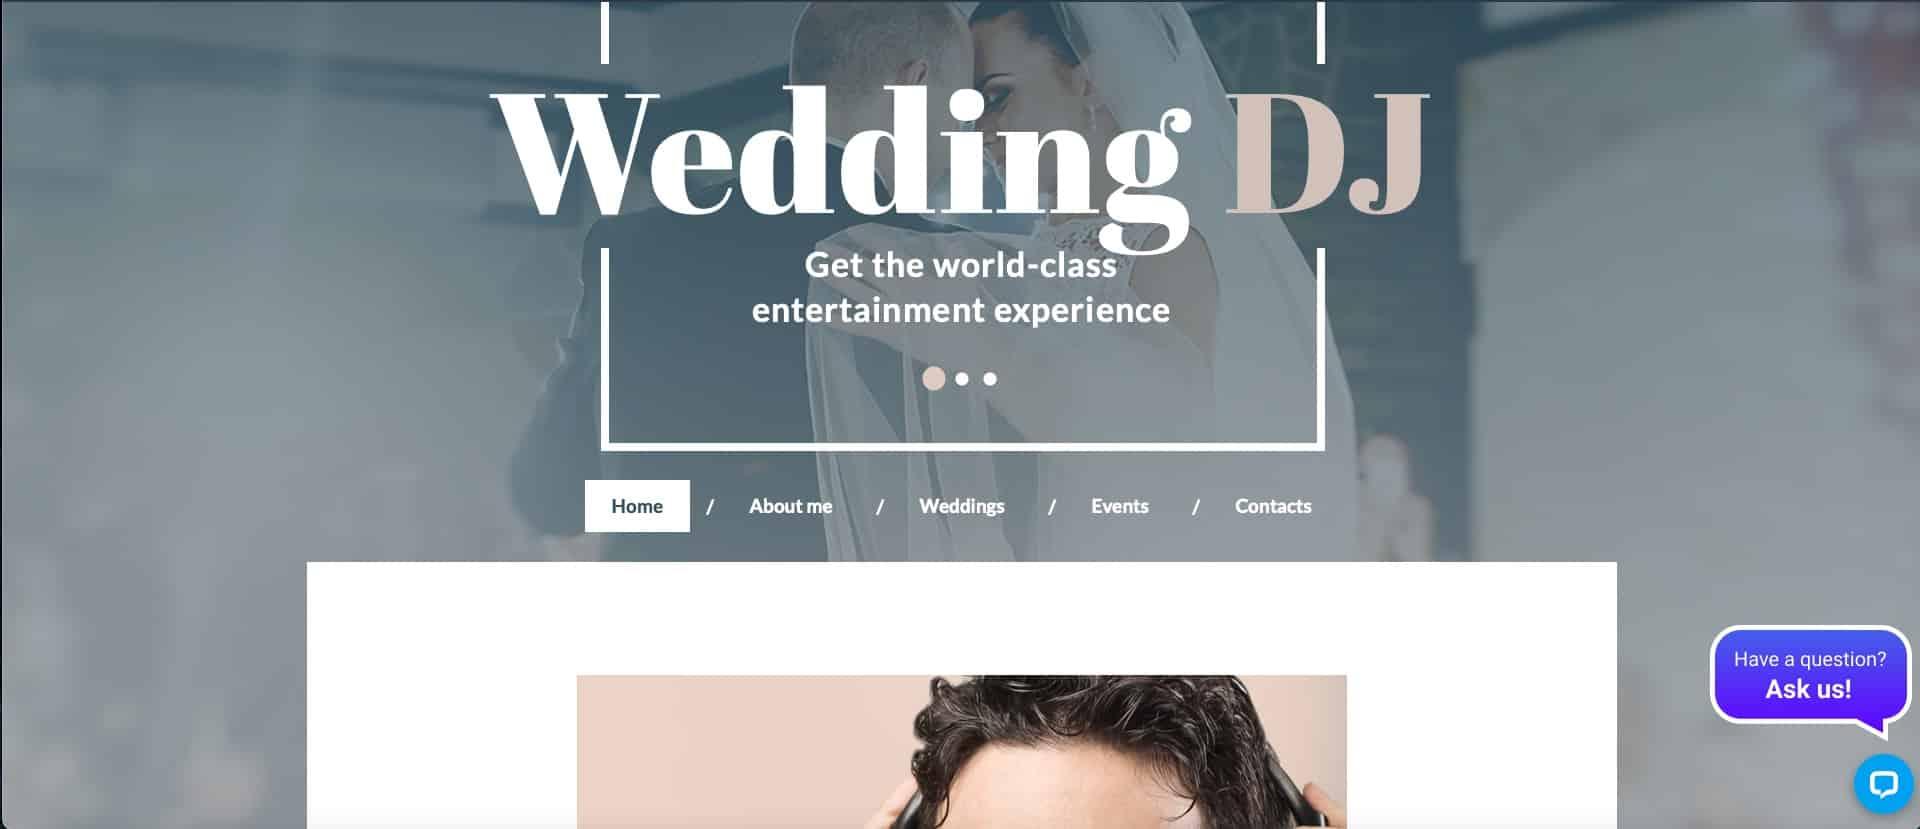 wedding DJ website template HTML